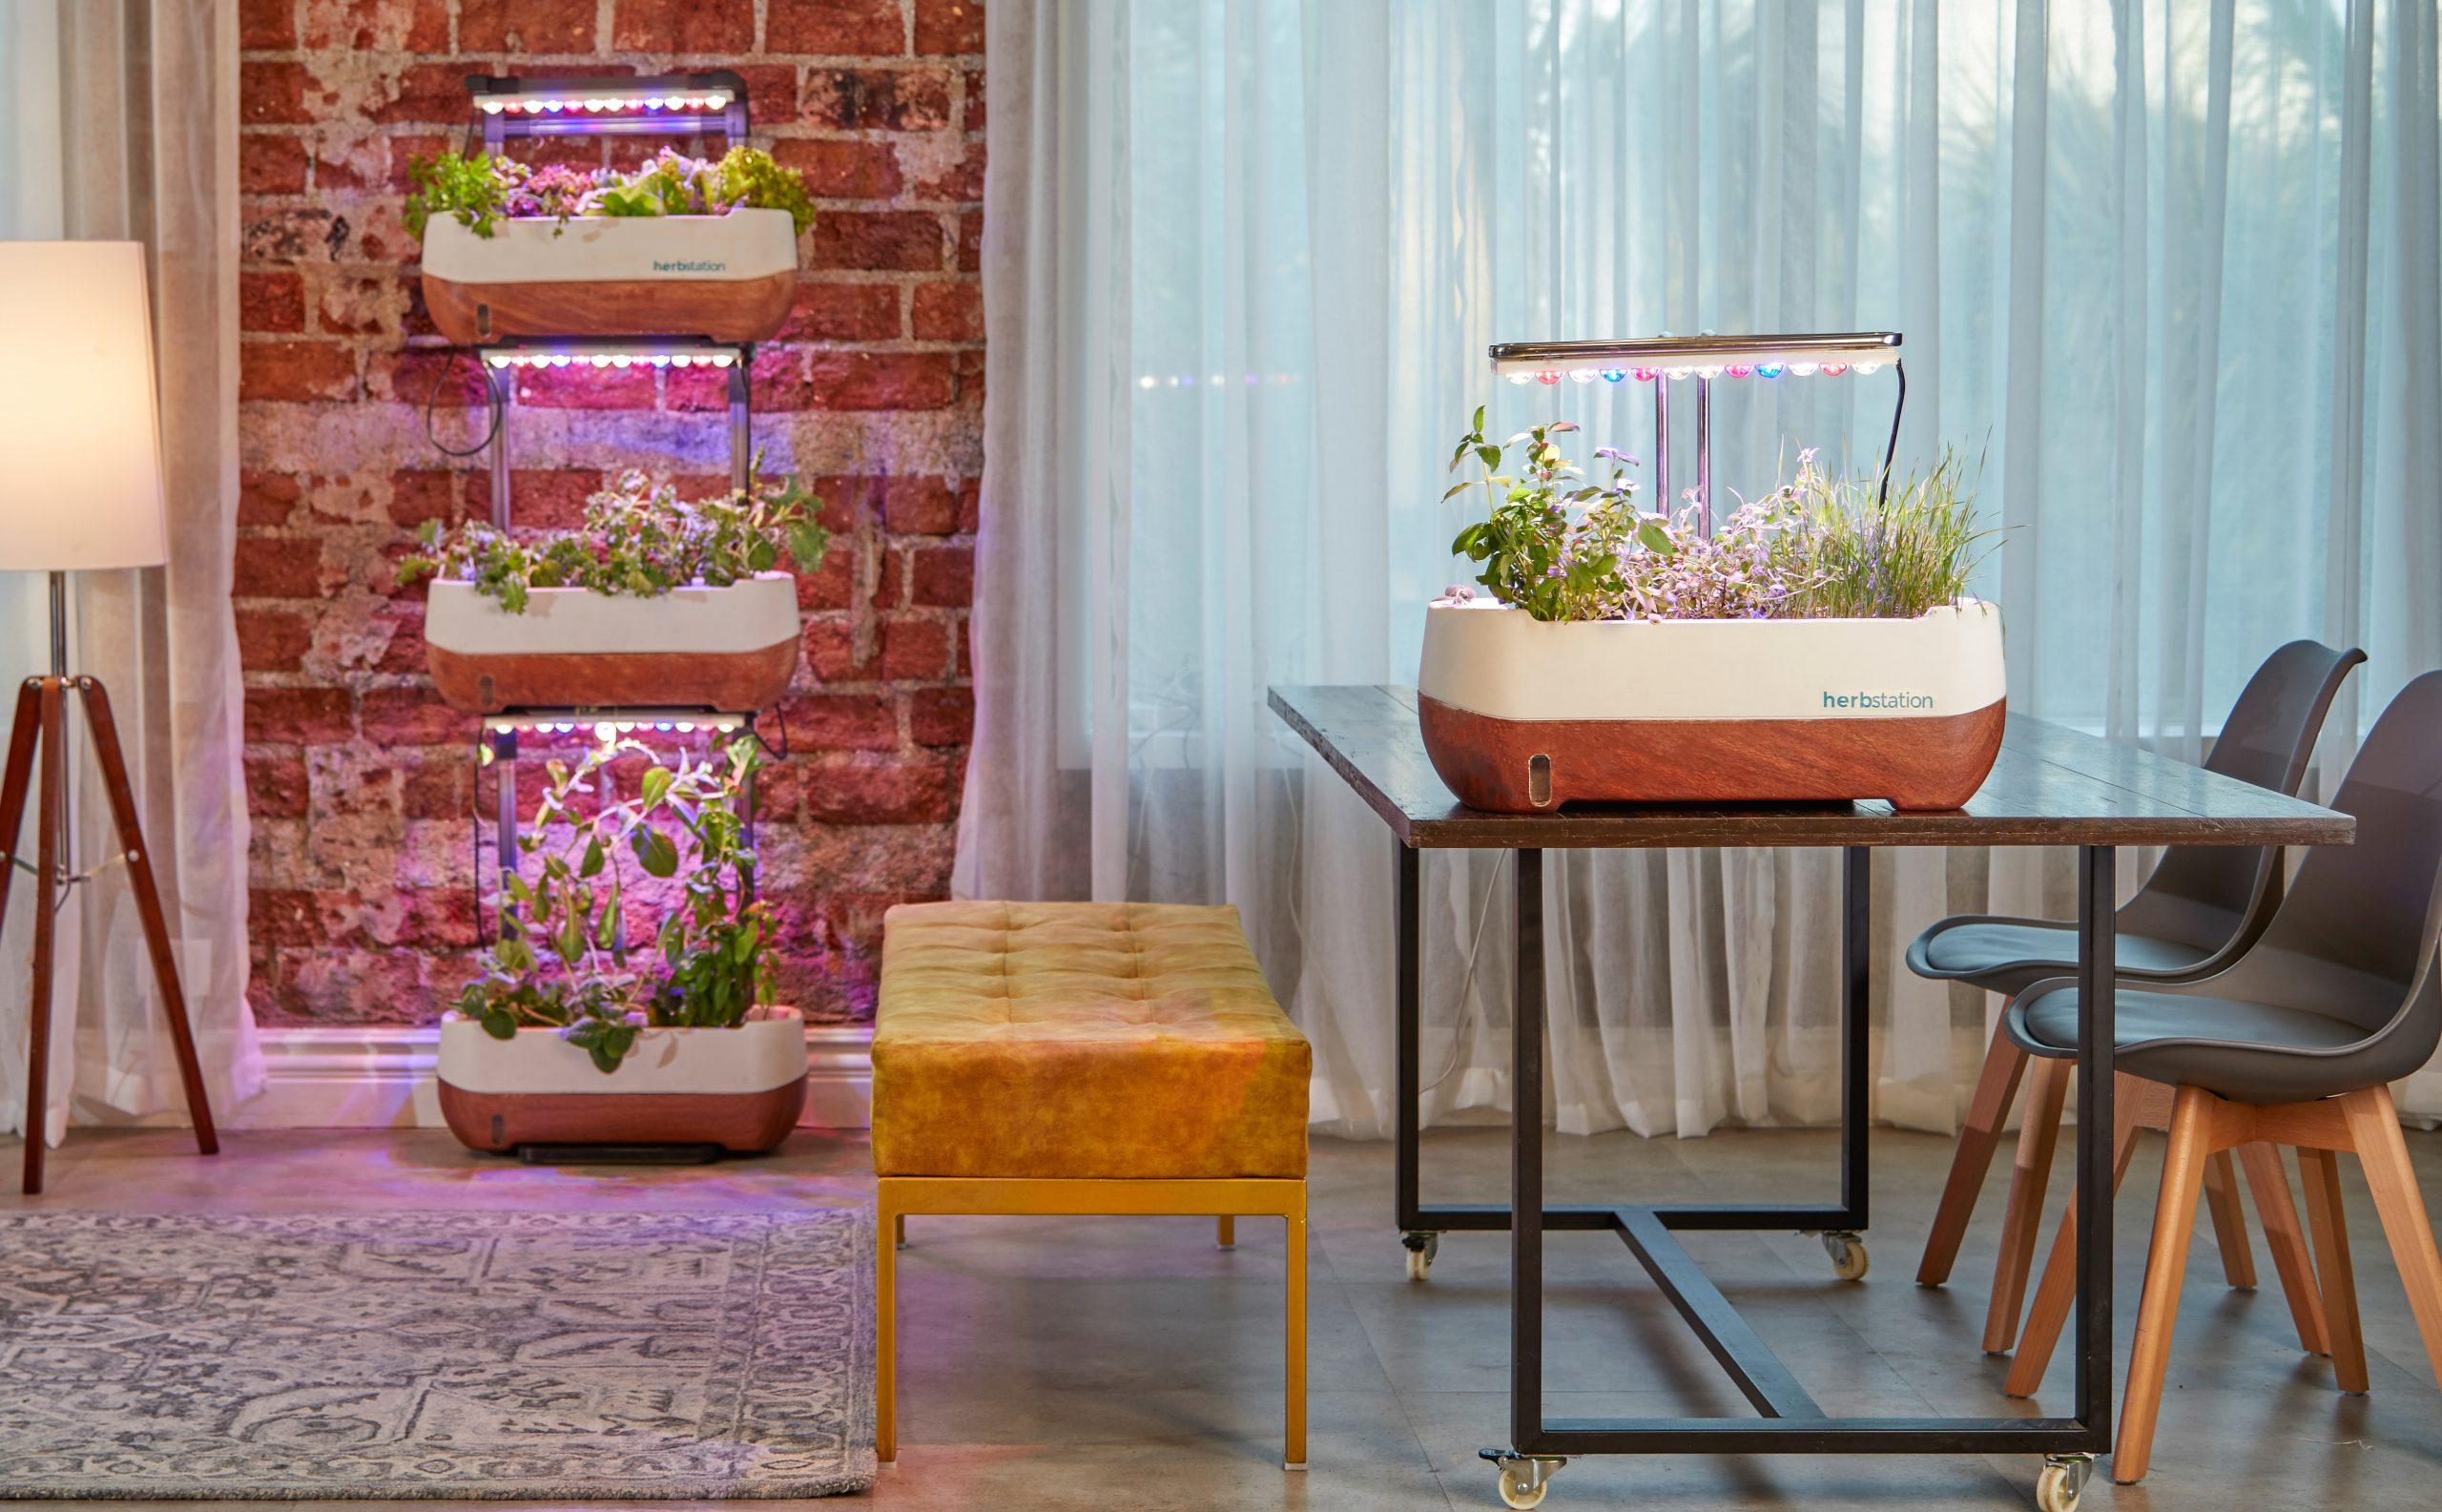 Plant grow light devices